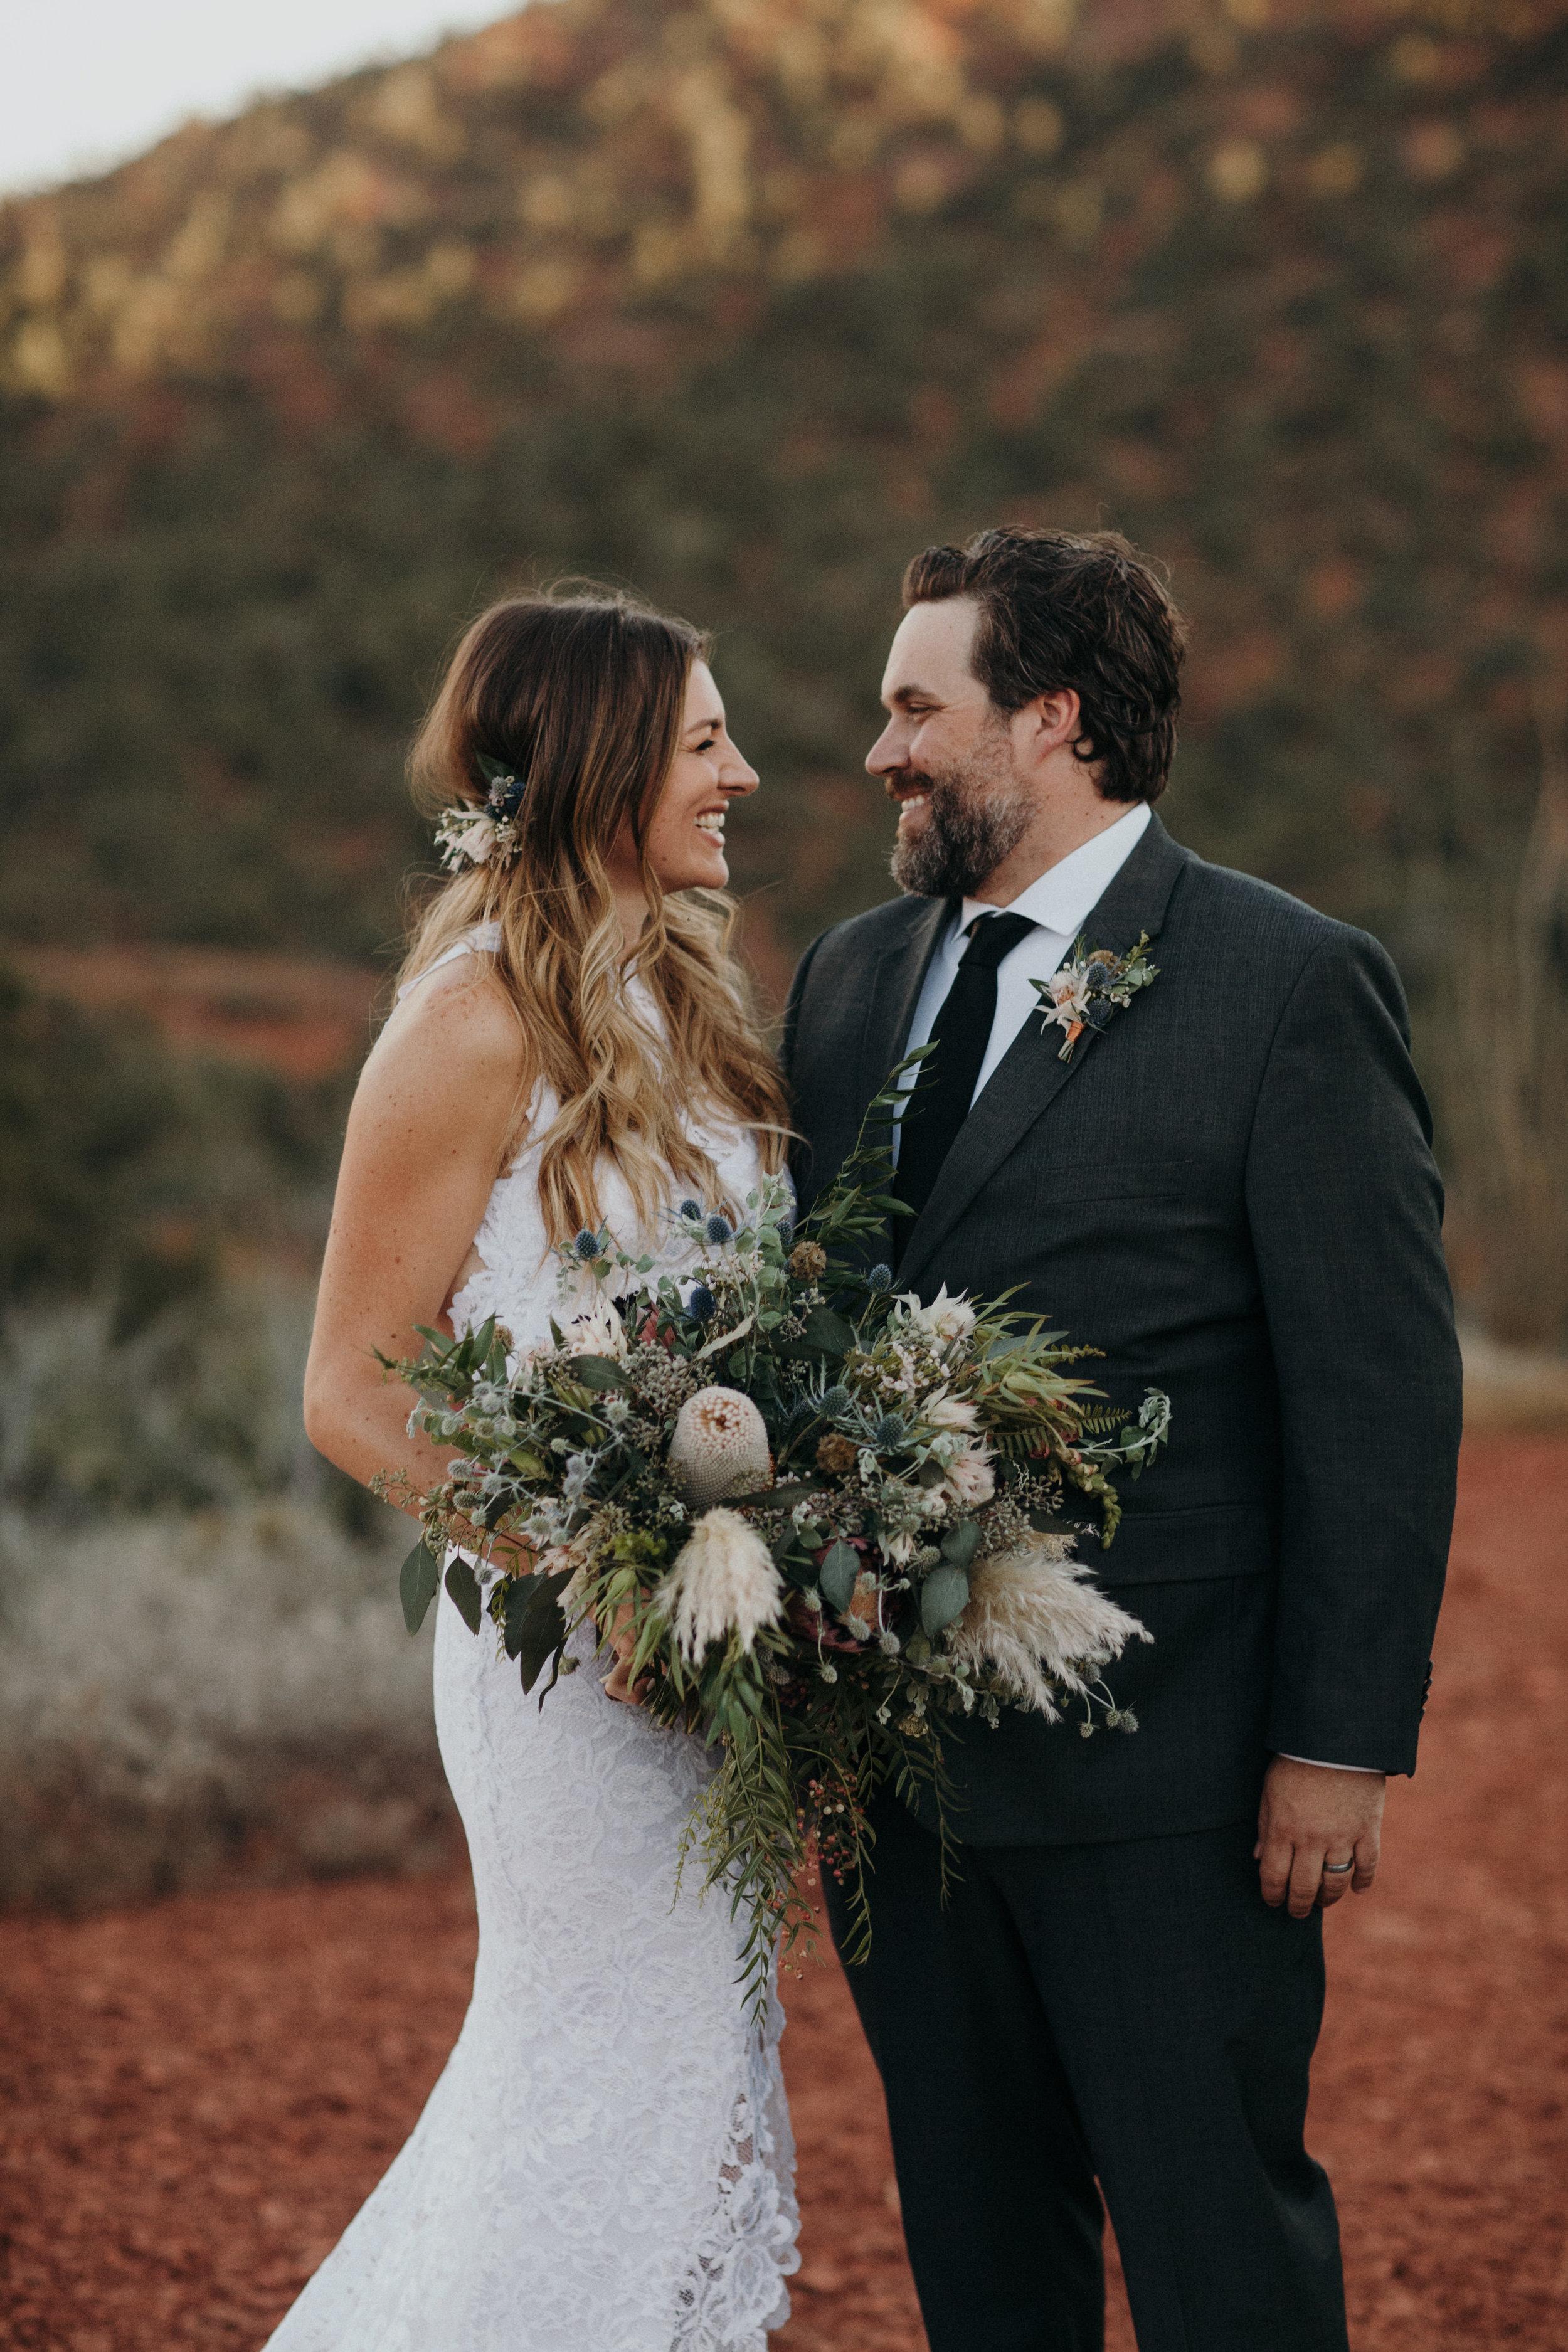 Sedona Wedding - Desert Inspired Bridal Bouquet